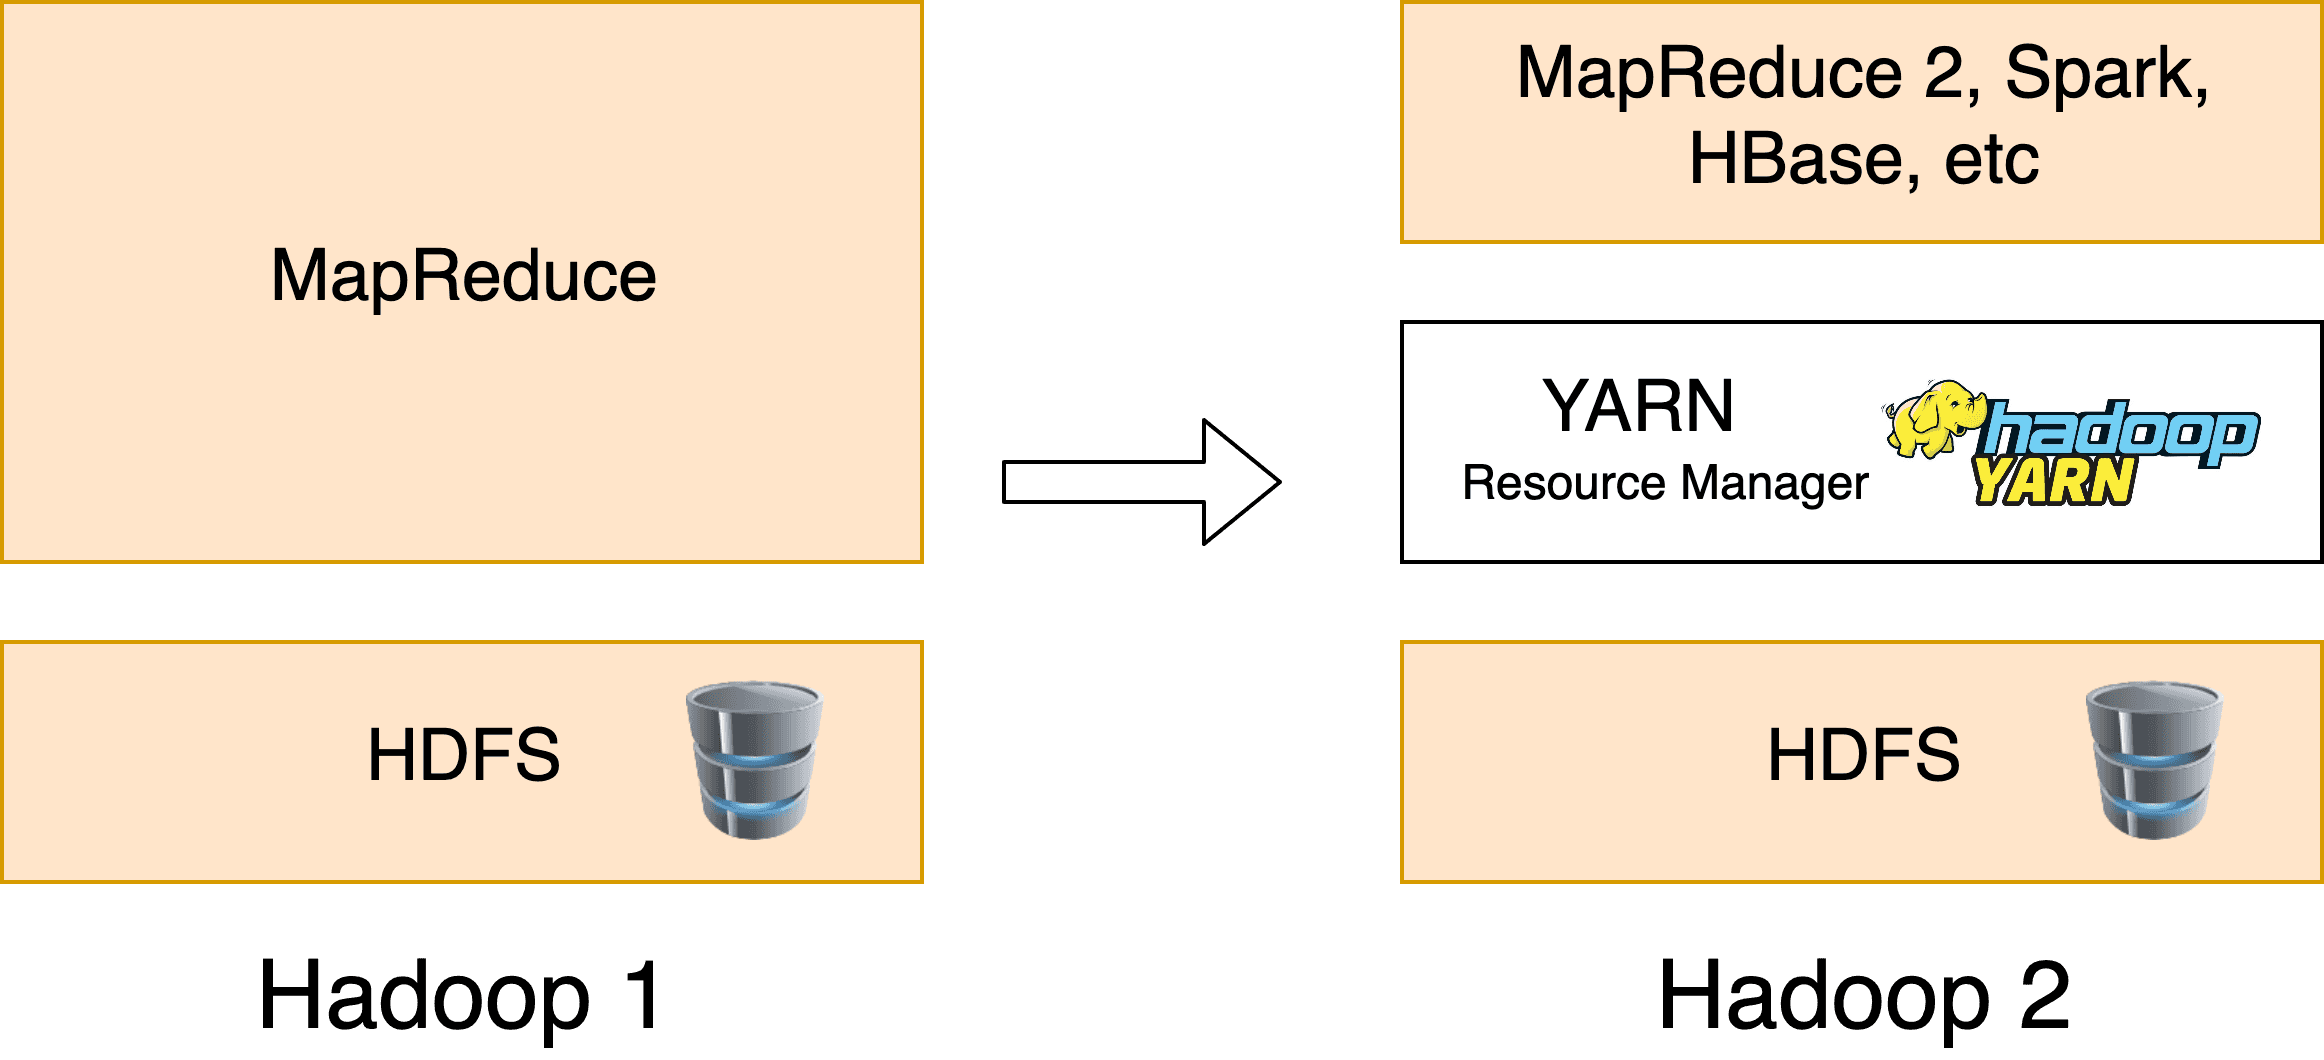 Apache Hadoop 1 vs 2 Yarn